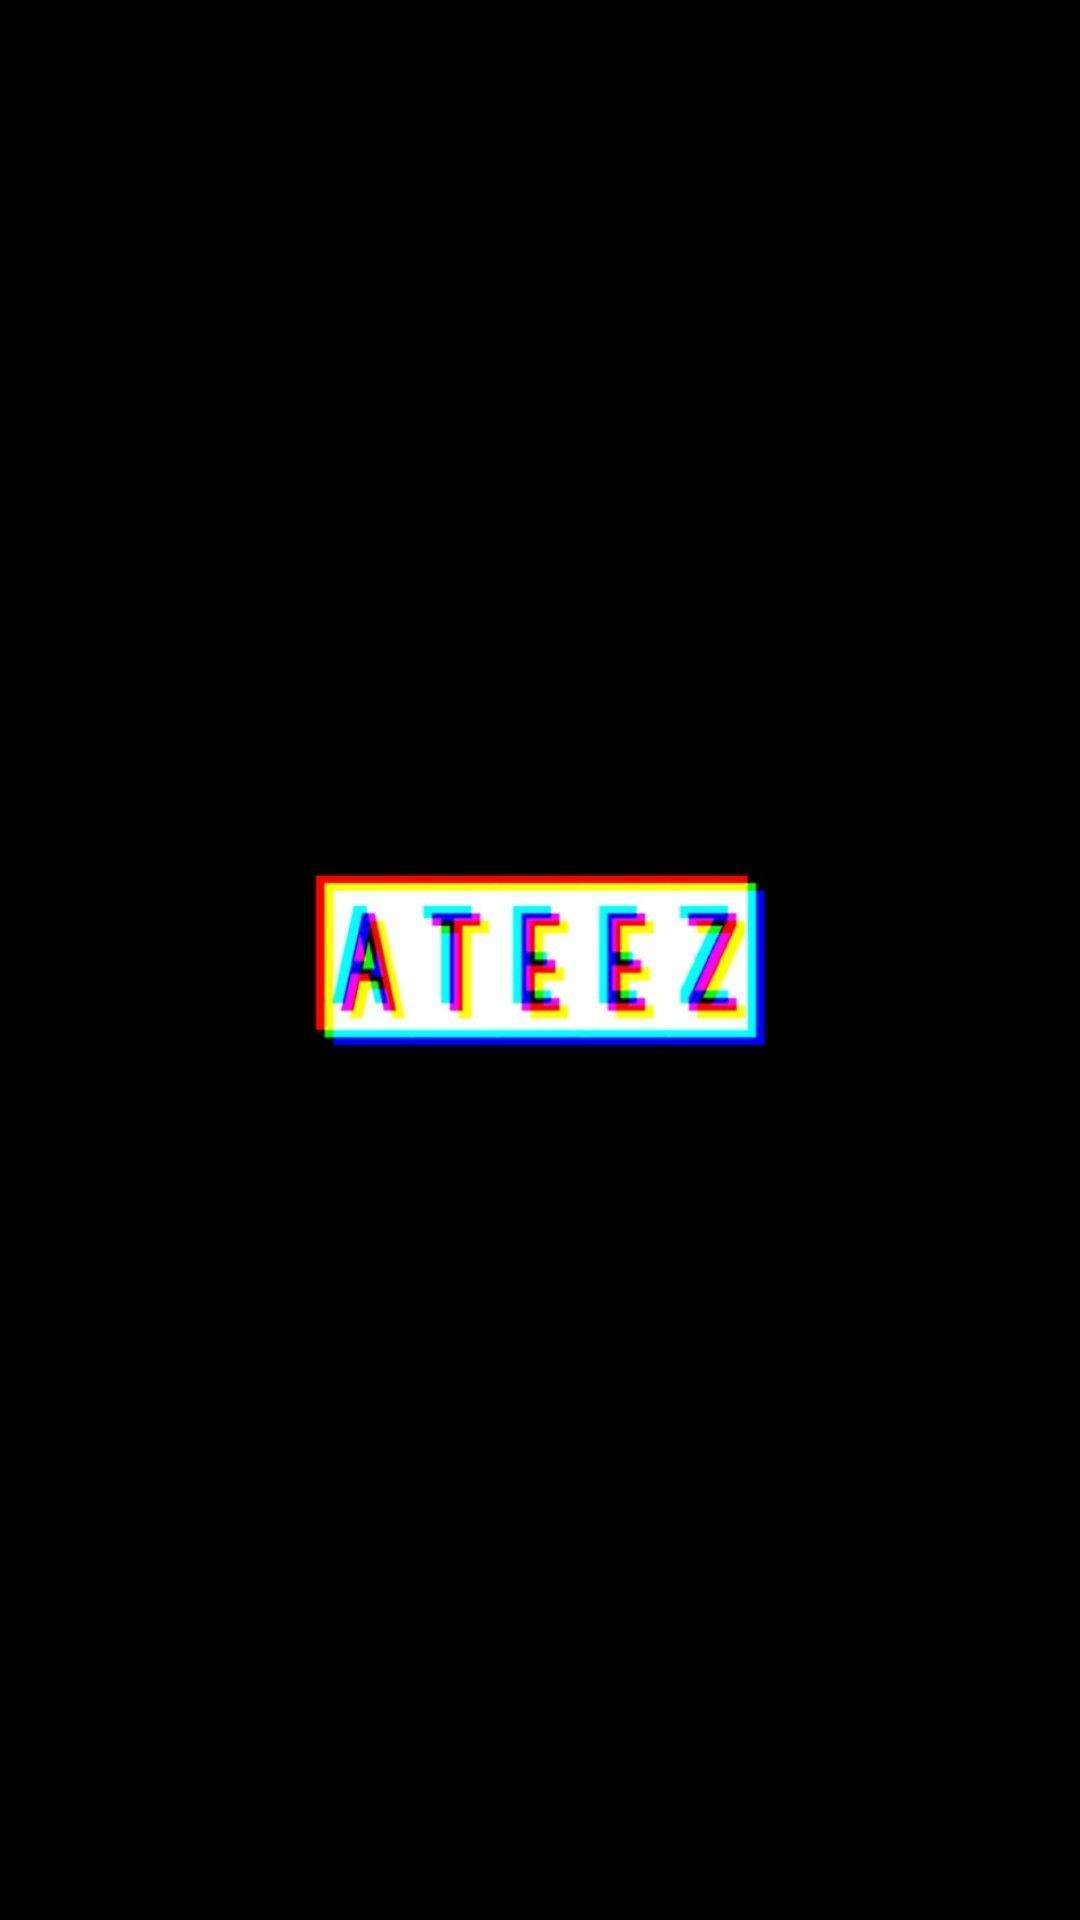 Ateez Logo Wallpapers - Wallpaper Cave